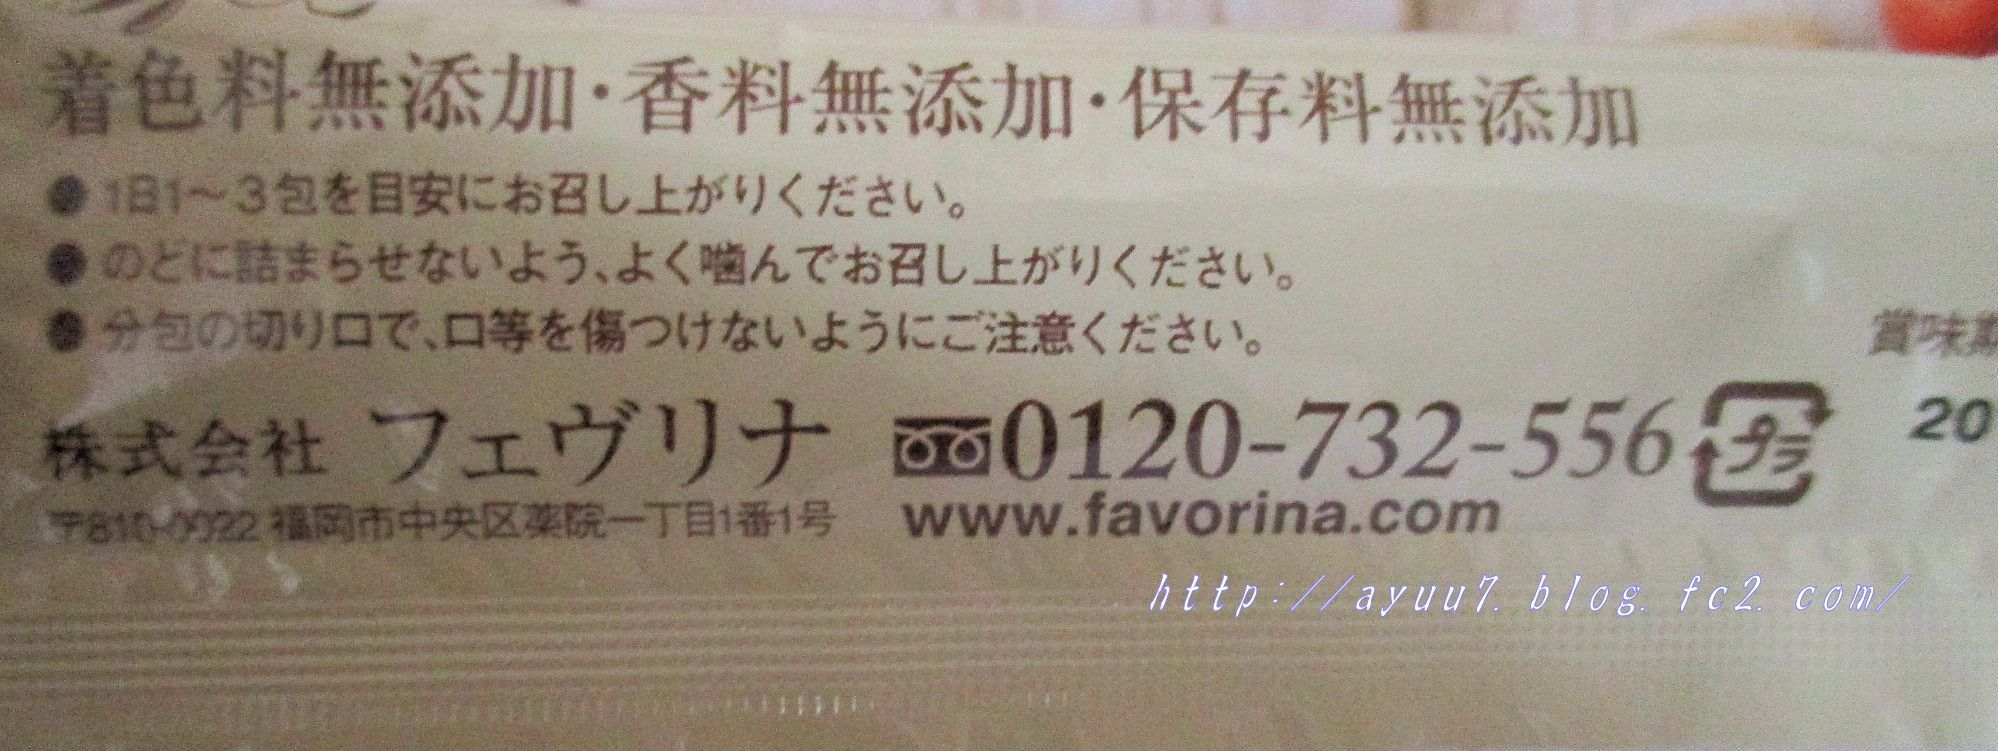 itizukouso4.jpg